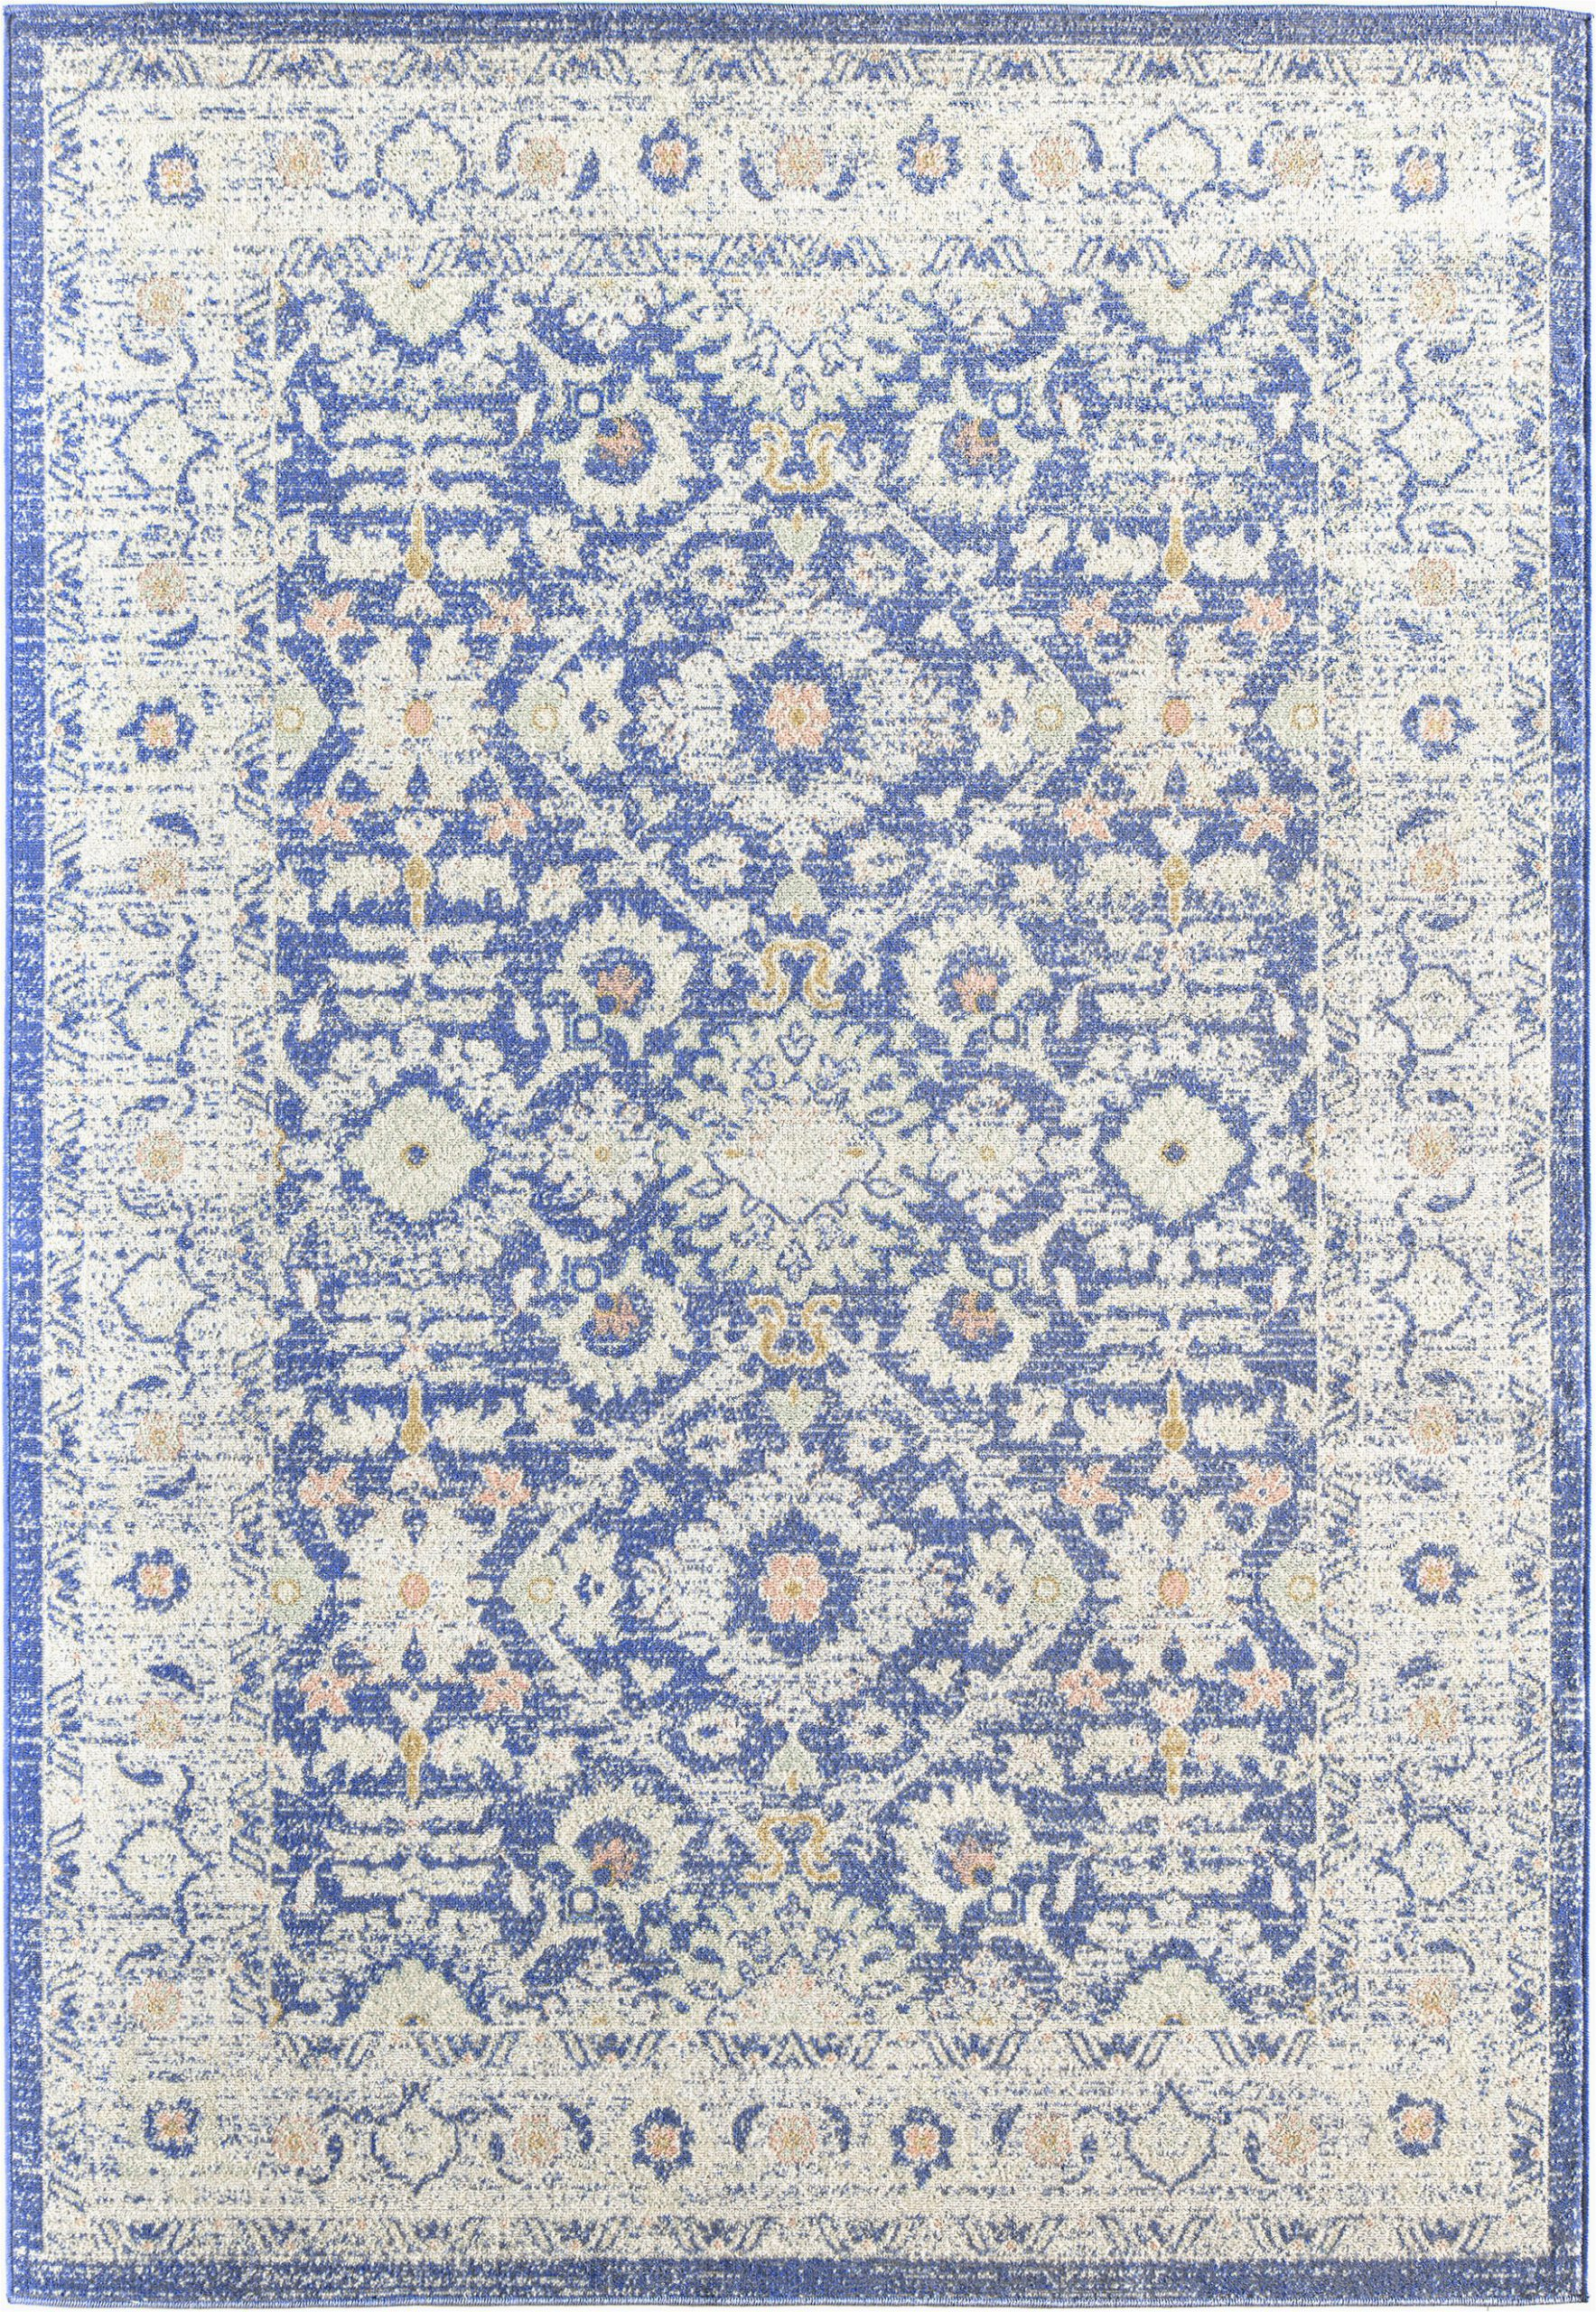 reva transitional bluegray indooroutdoor area rug